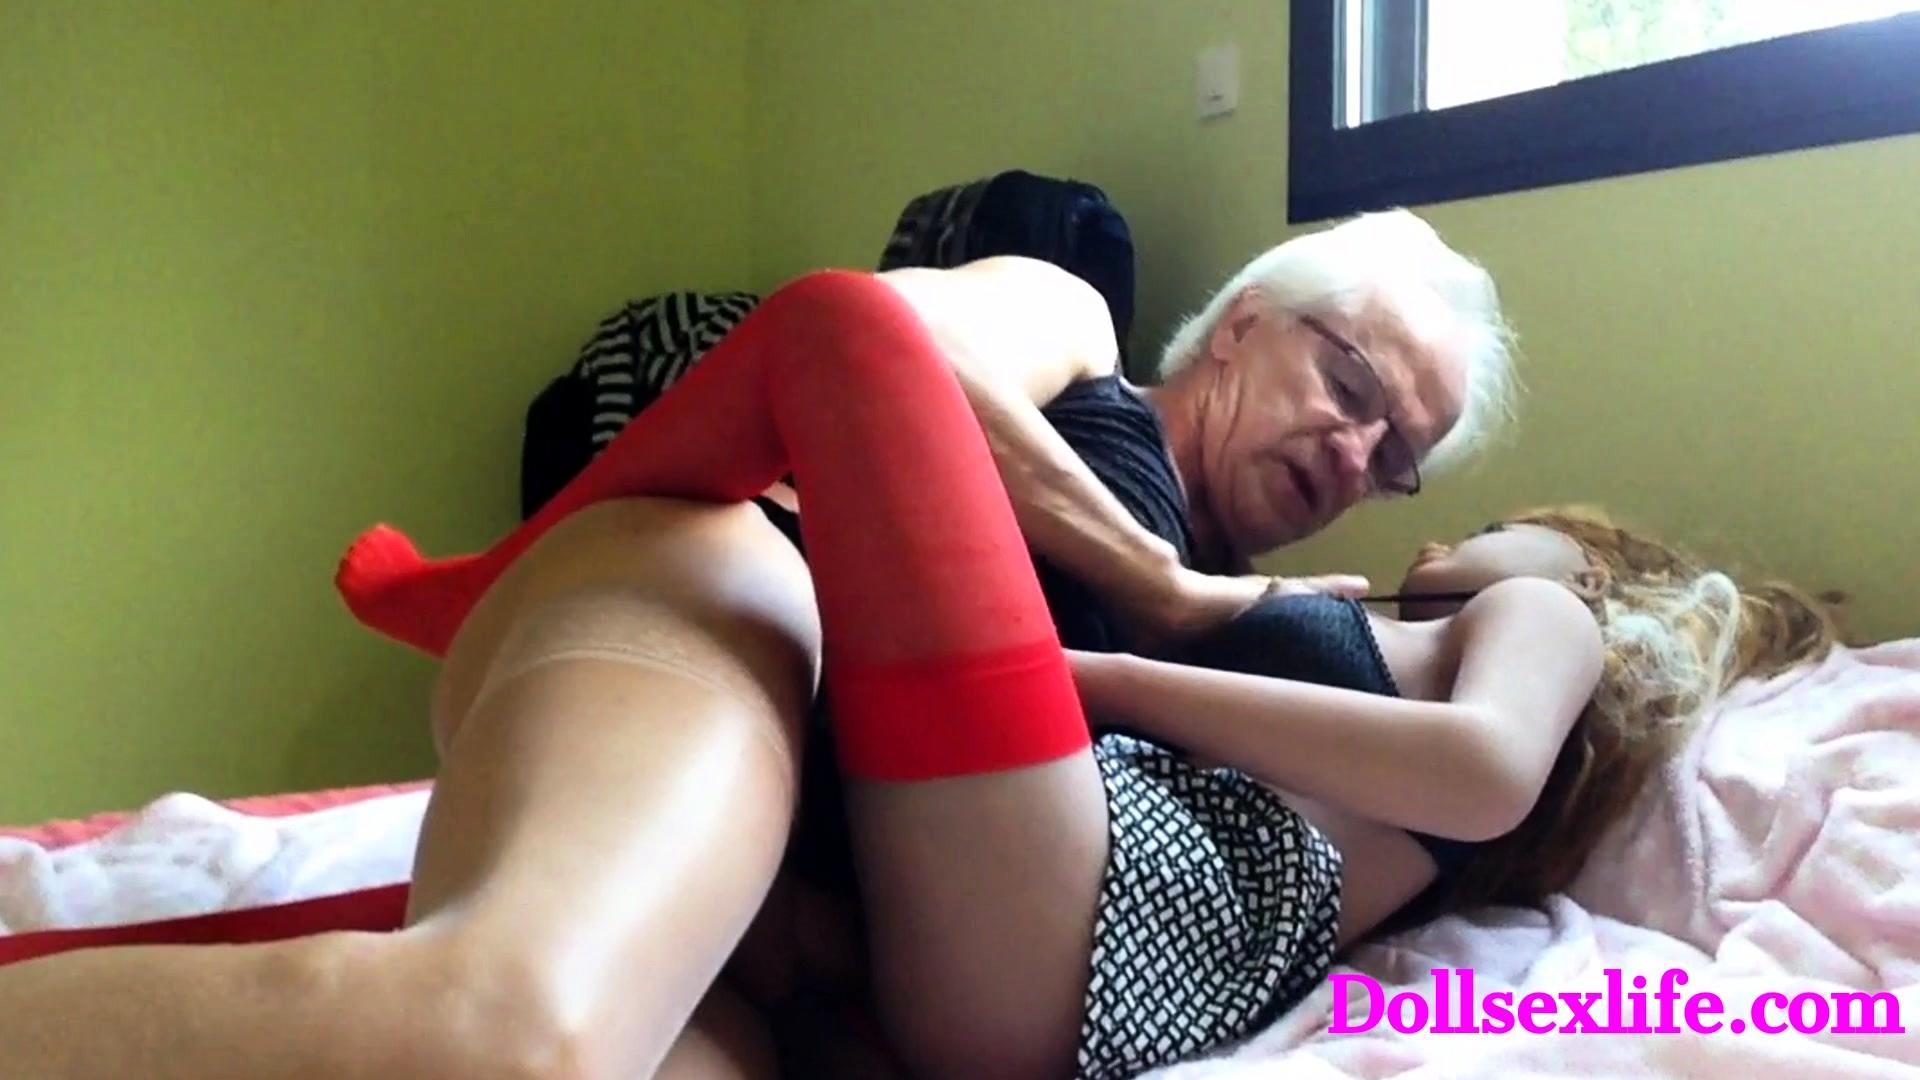 sexy ass sex from behind